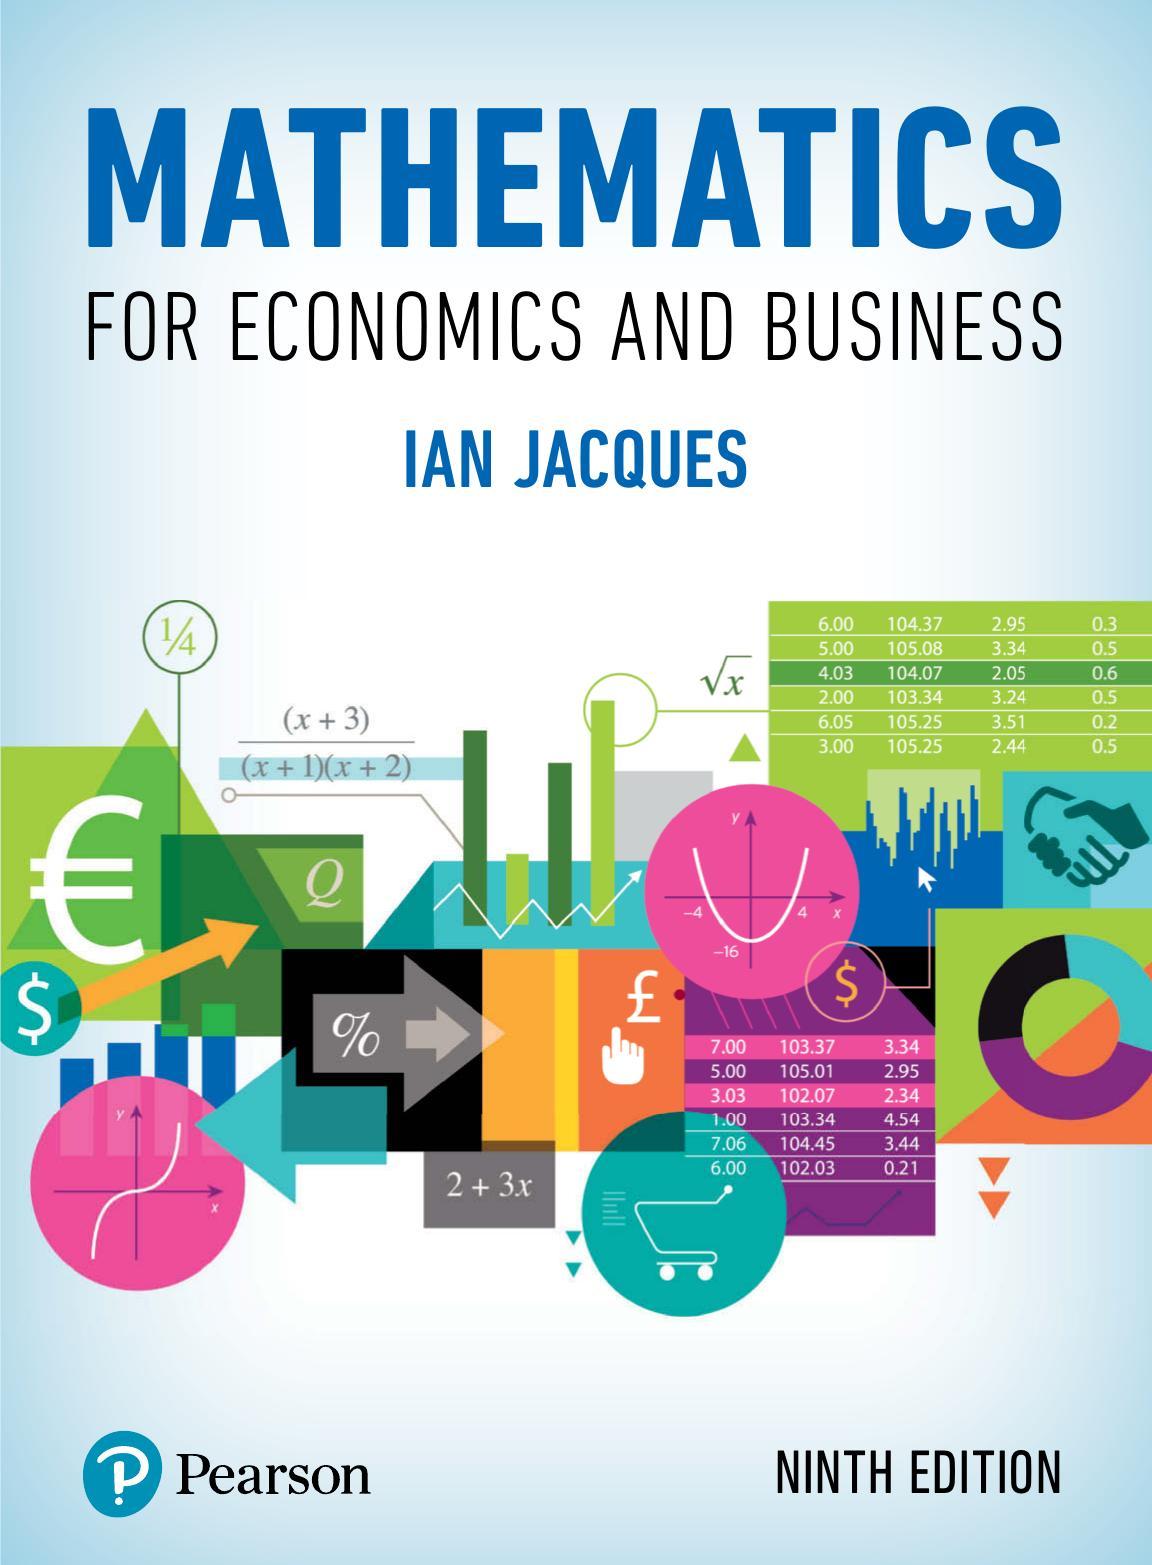 Essential mathematics for economics and business 4th edition pdf